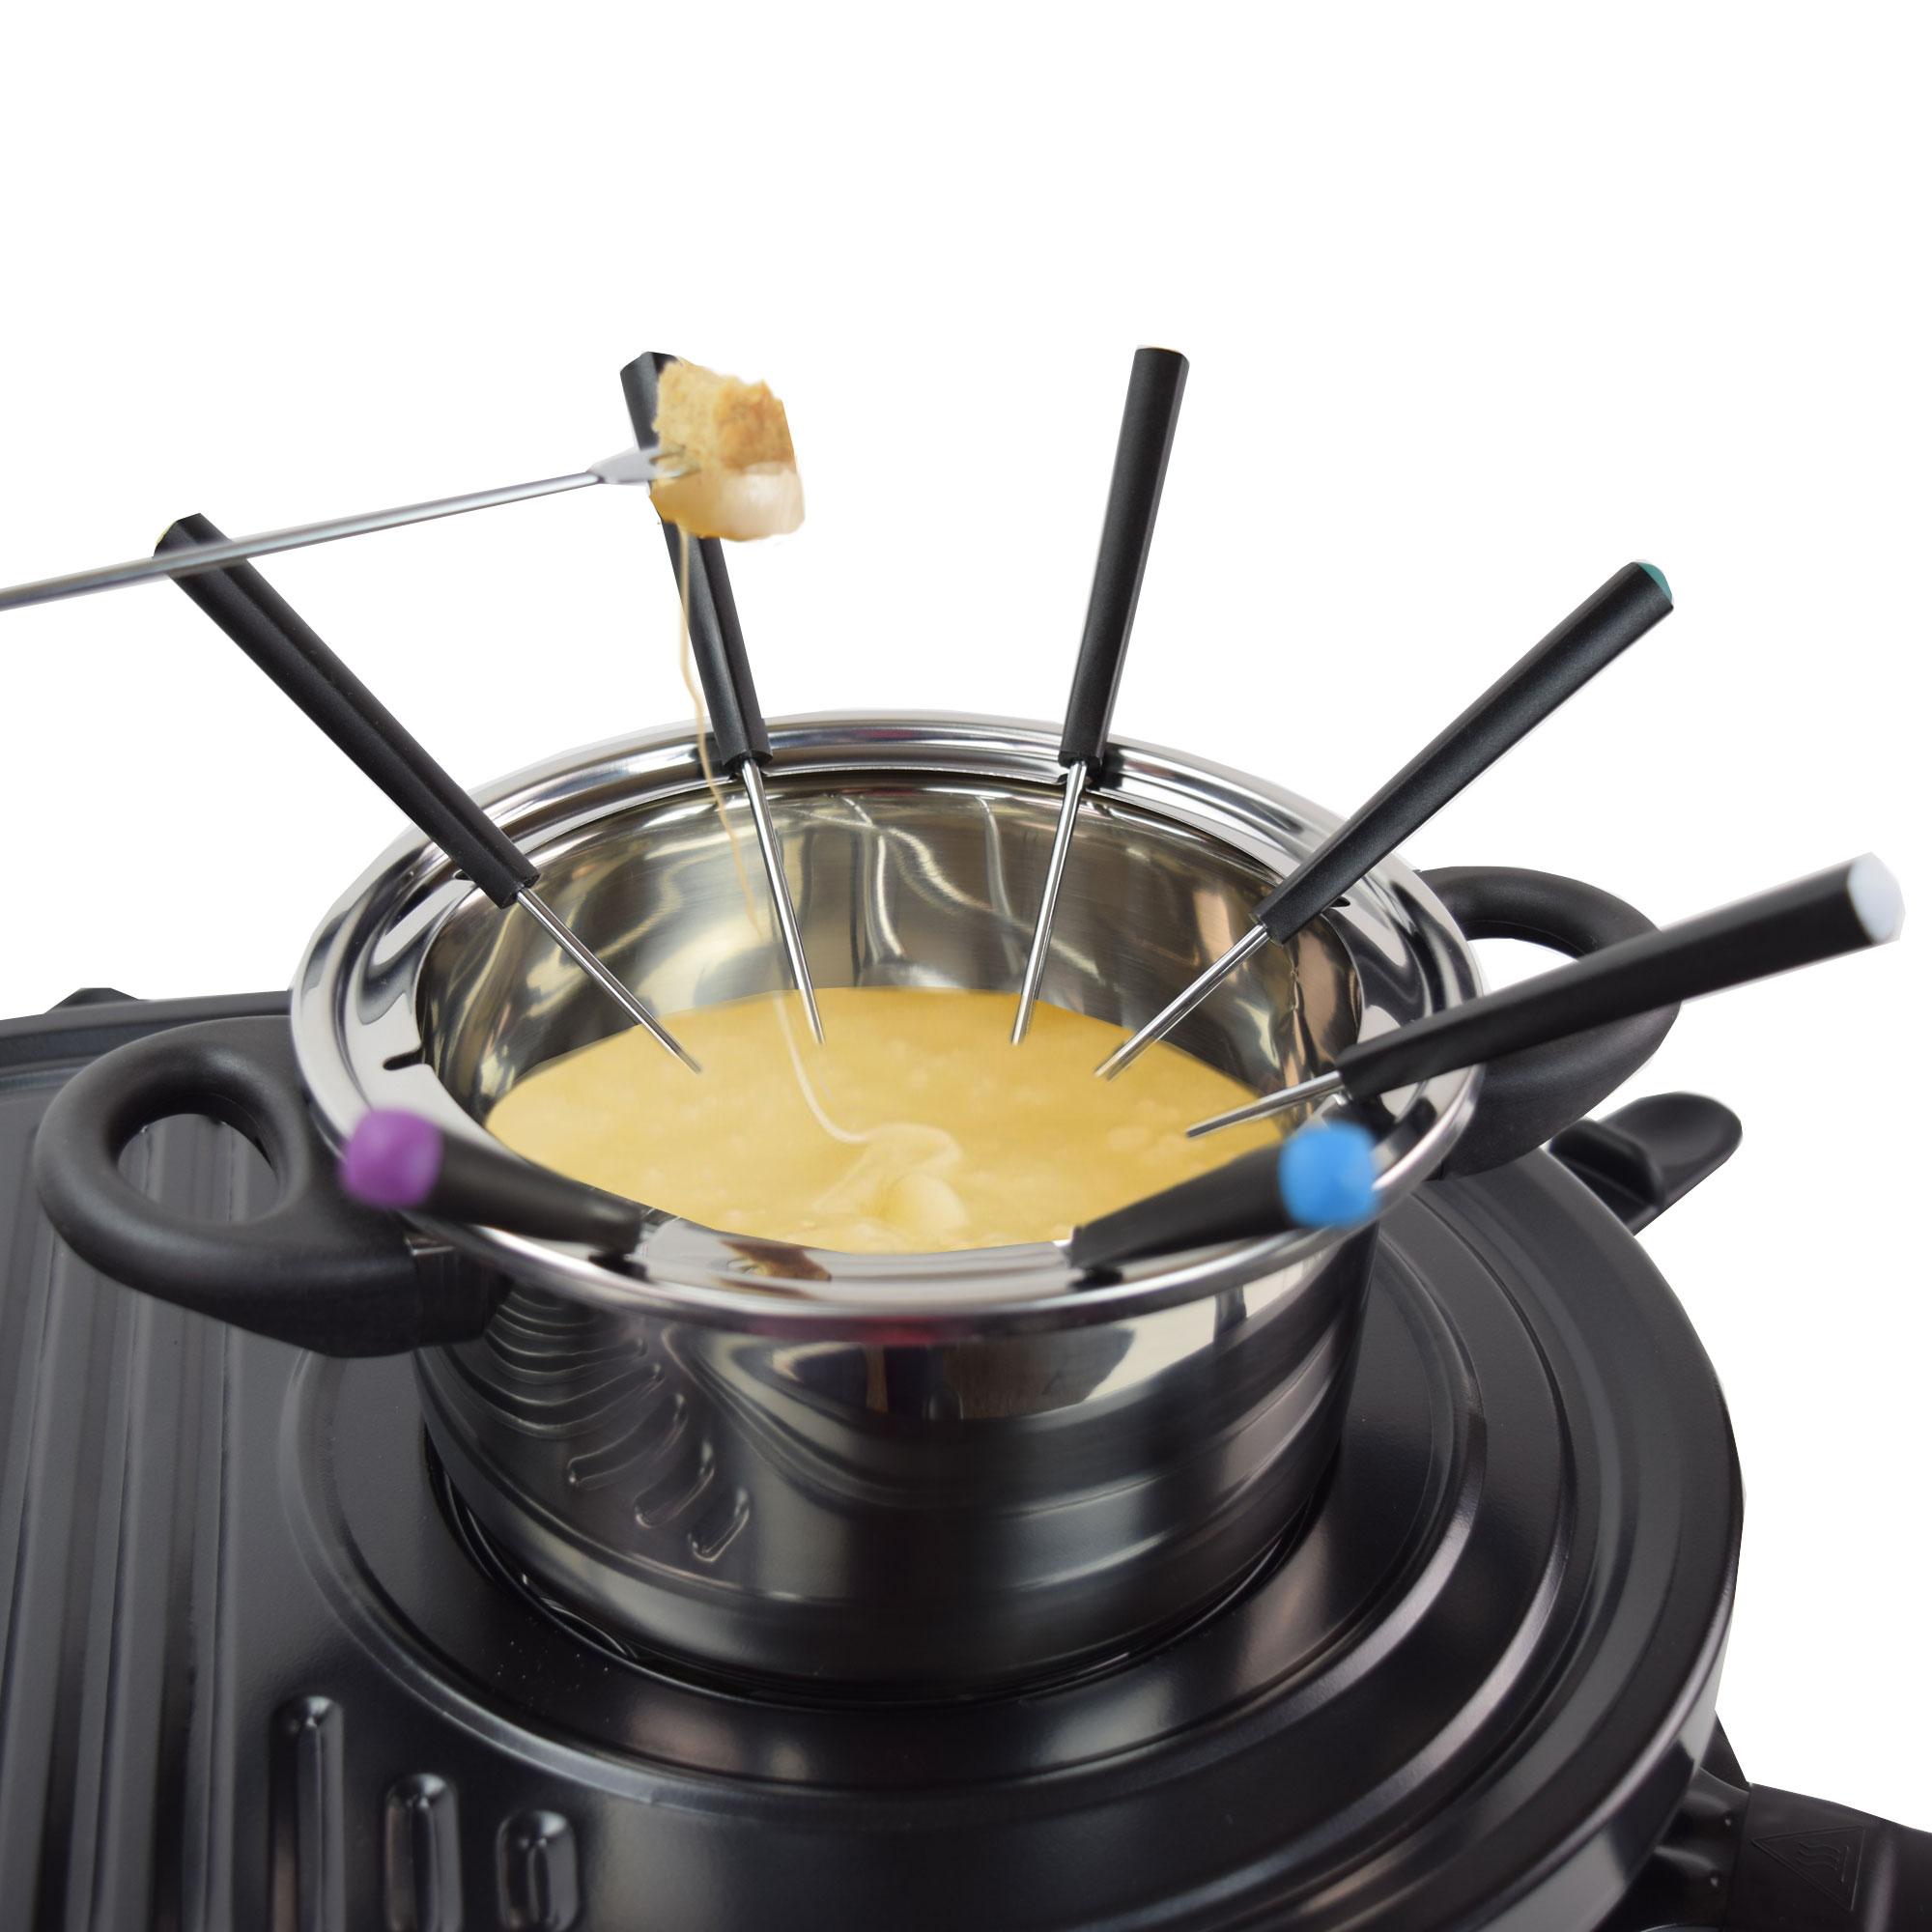 4 in 1 raclette grill heisser stein fondue f r 8 personen syntrox ebay. Black Bedroom Furniture Sets. Home Design Ideas